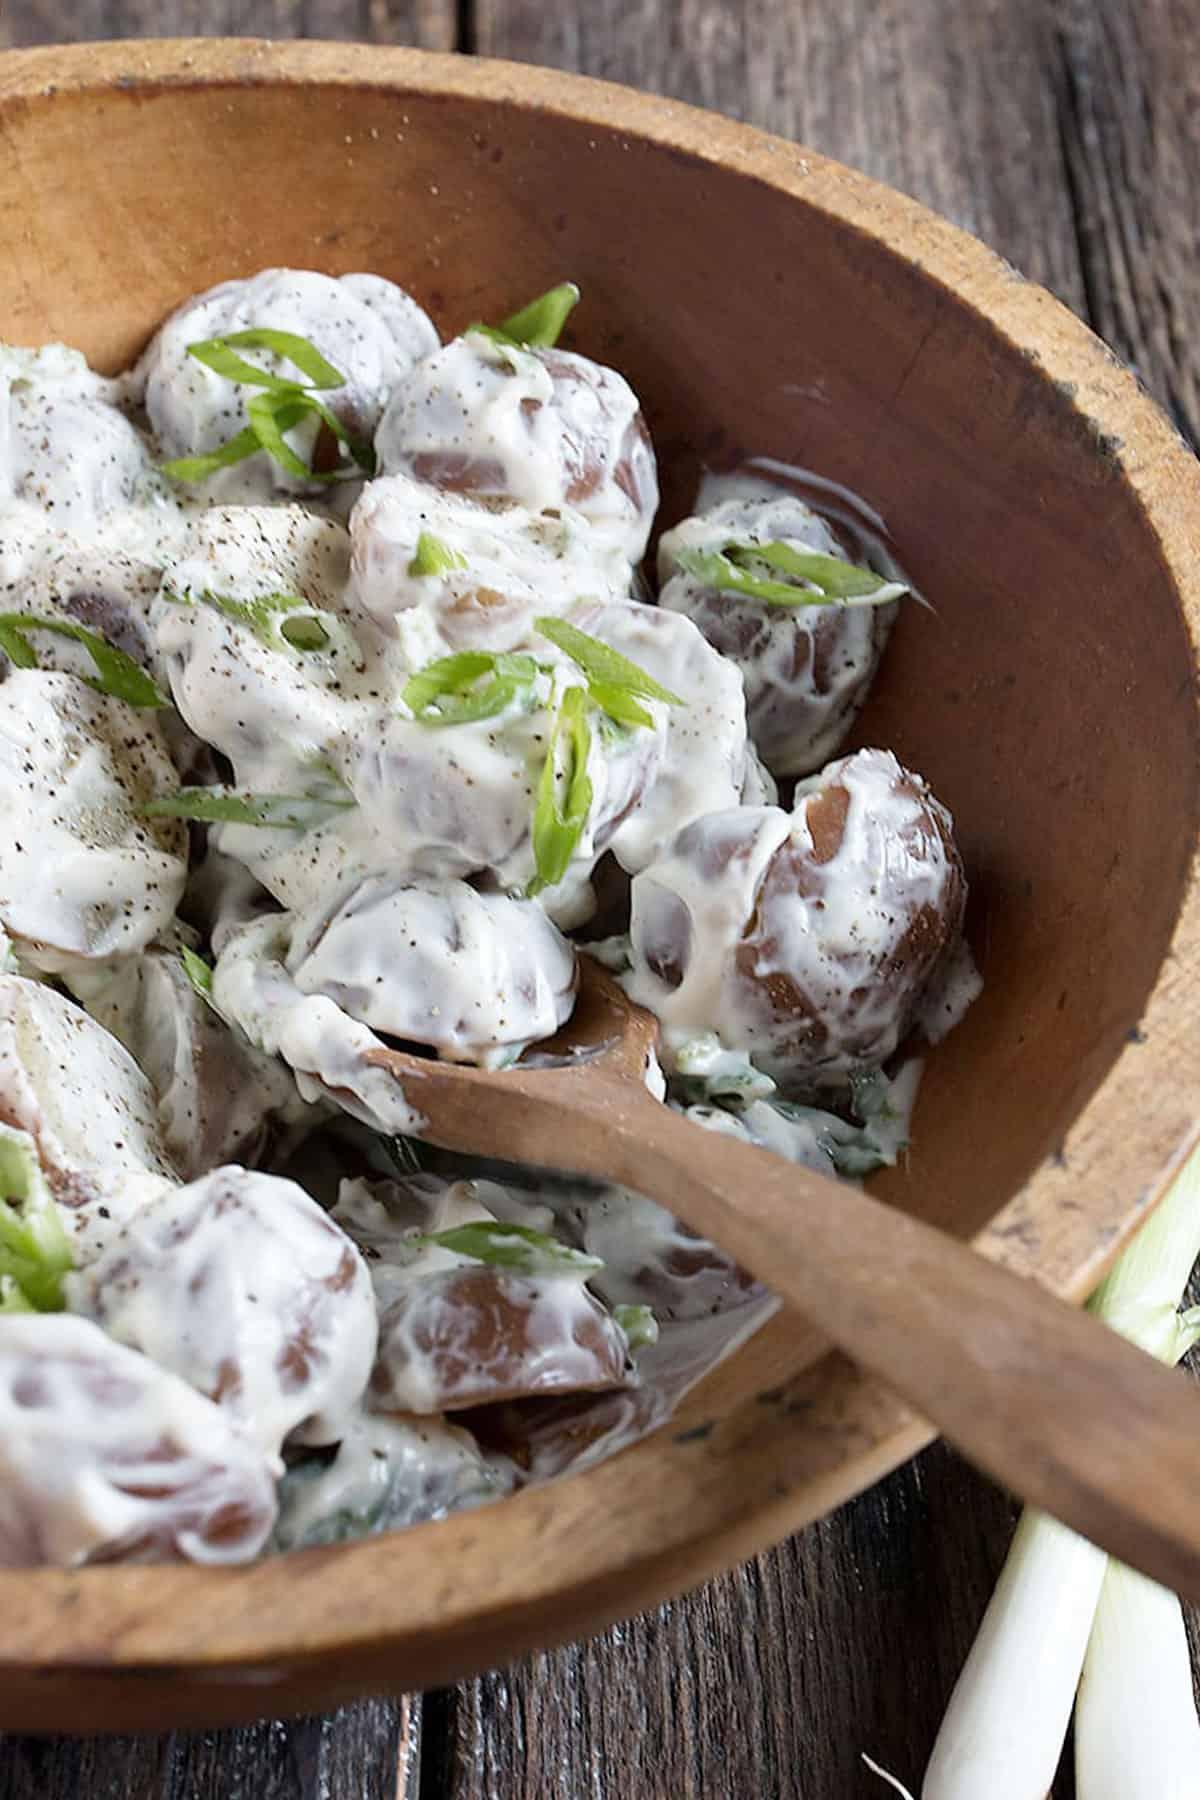 sour cream potato salad in wooden bowl